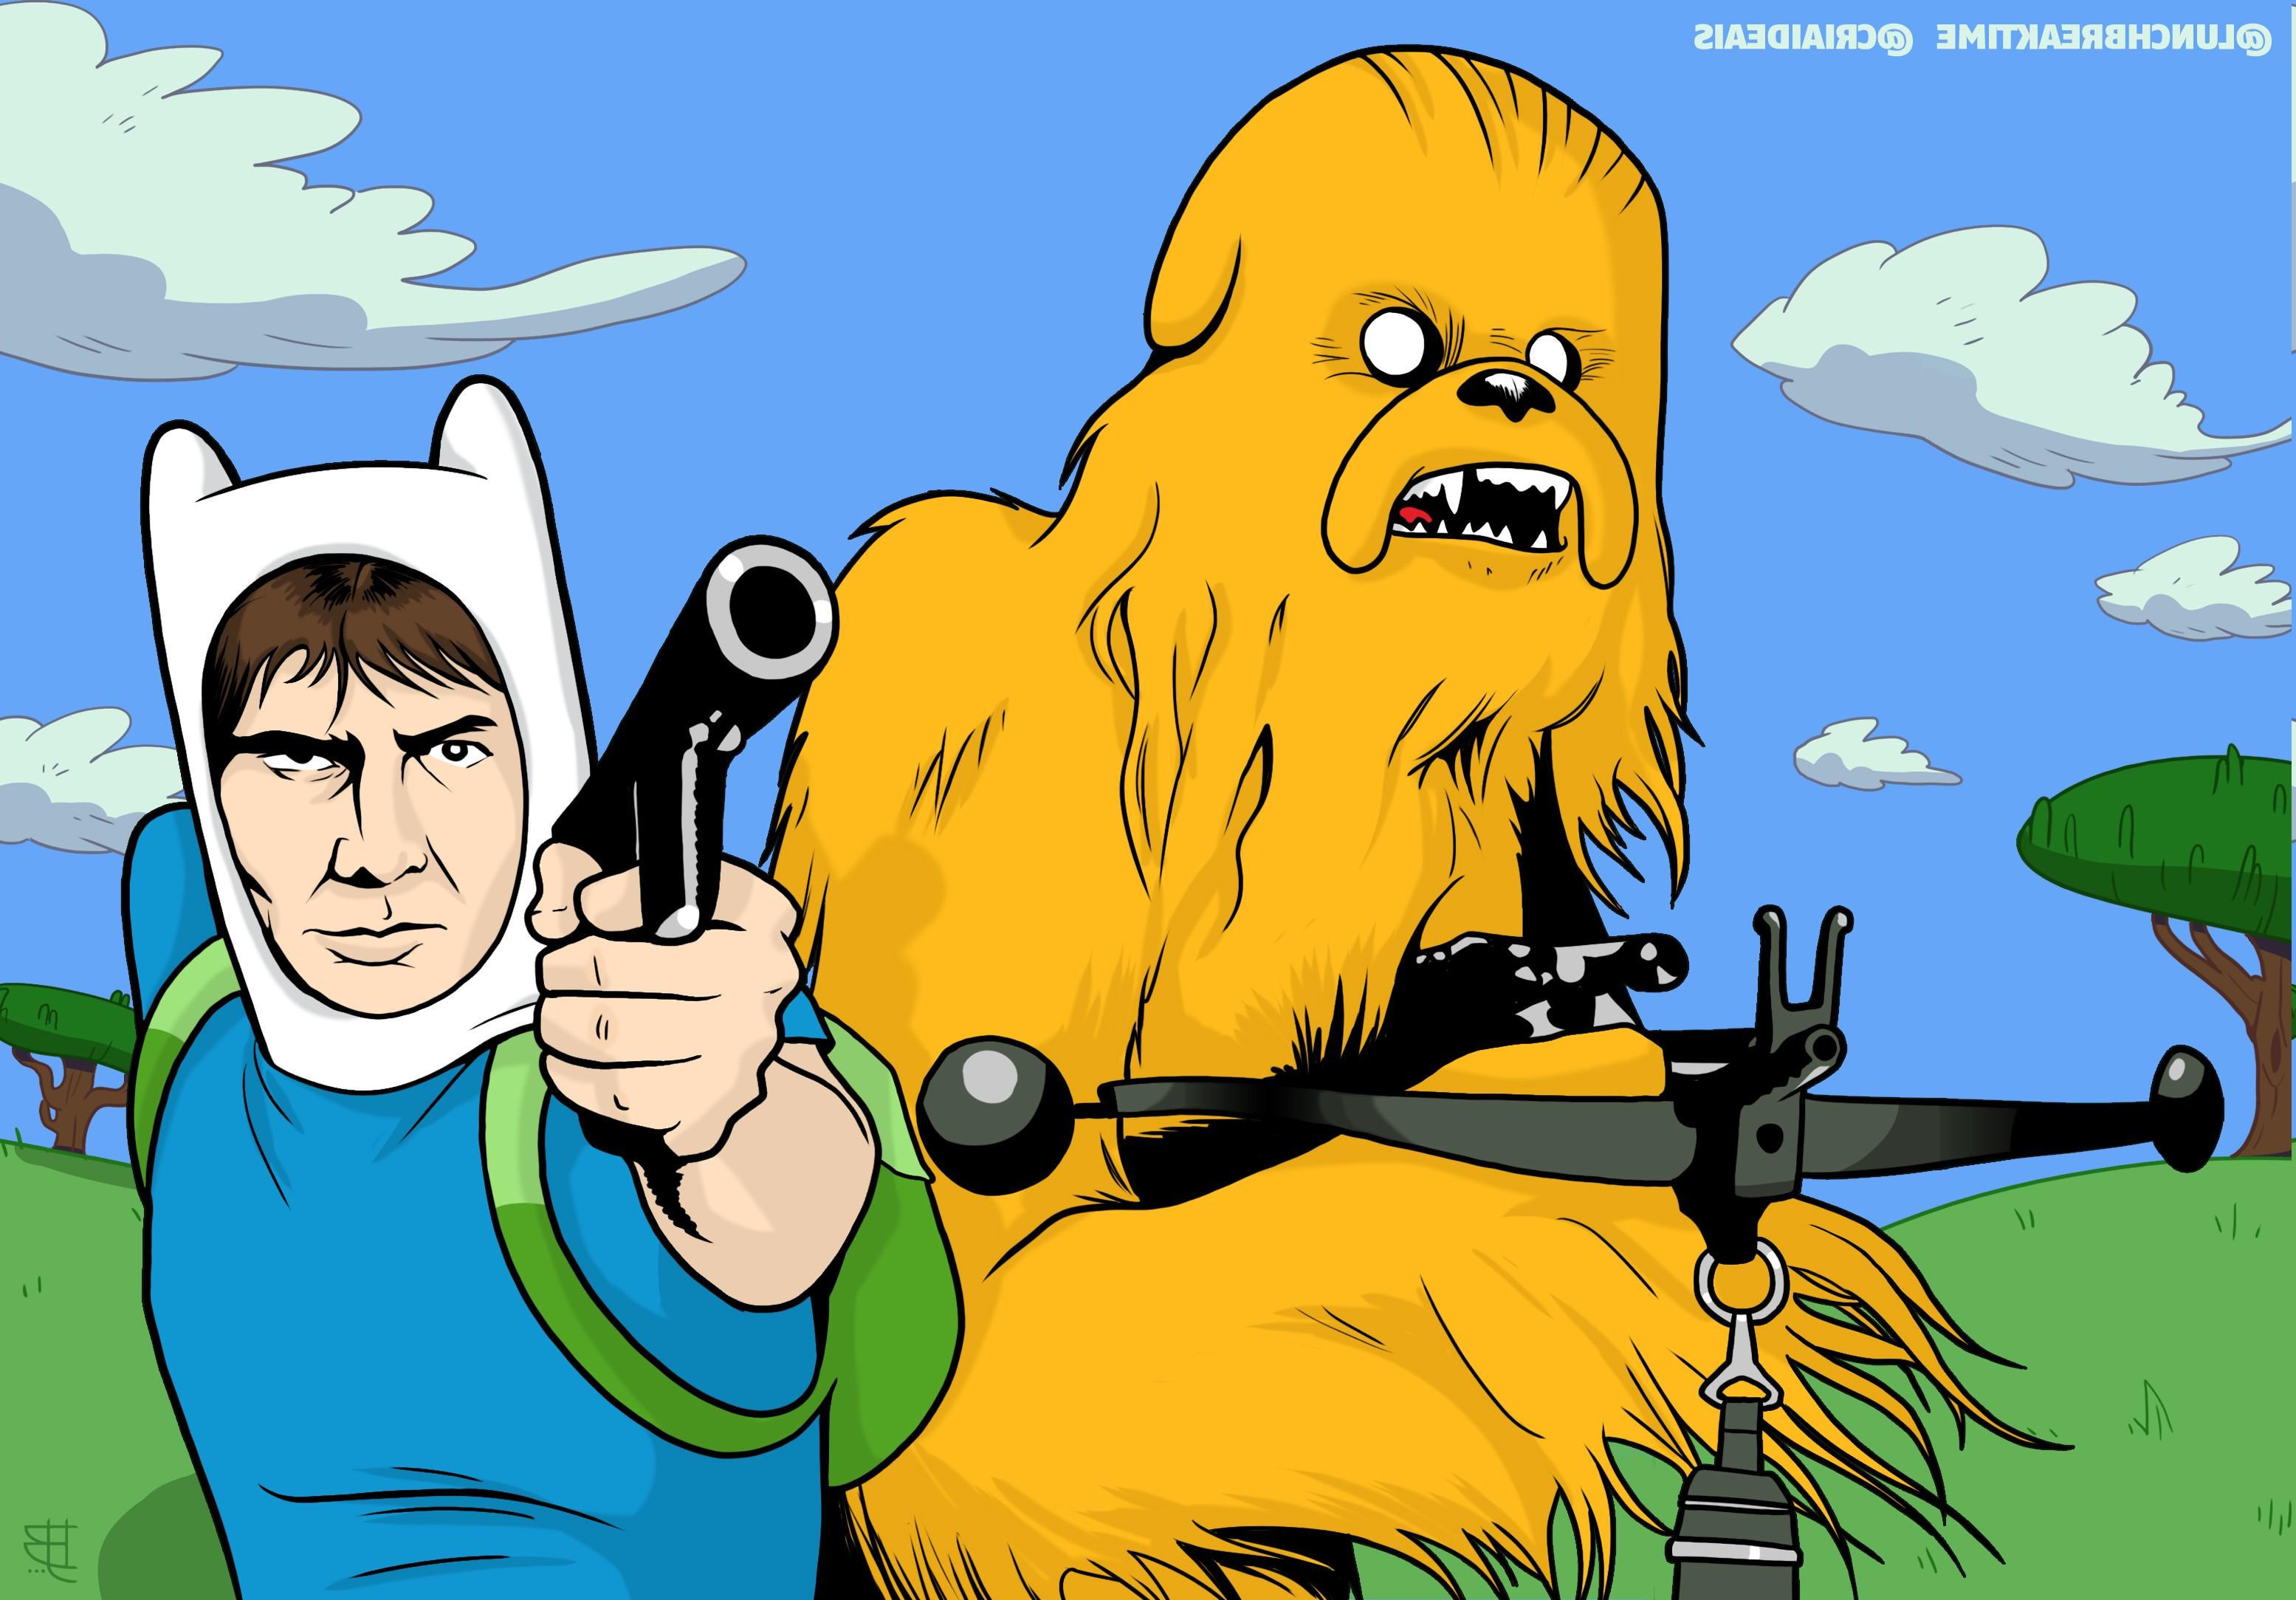 Wallpaper : illustration, Star Wars, grass, crossover, yellow ...